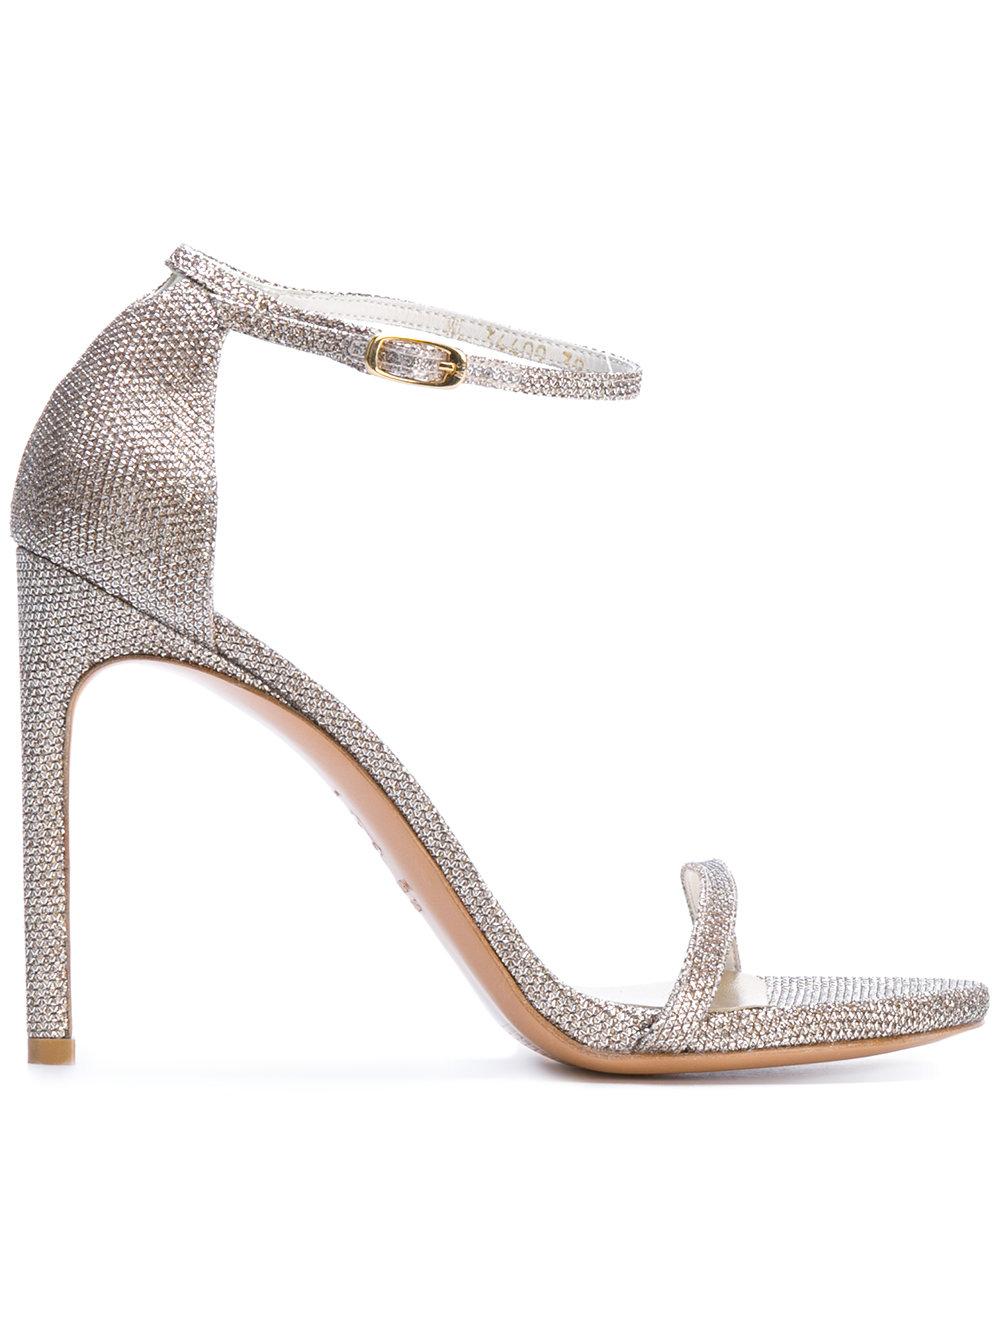 STUART WEITZMAN sandals - $425